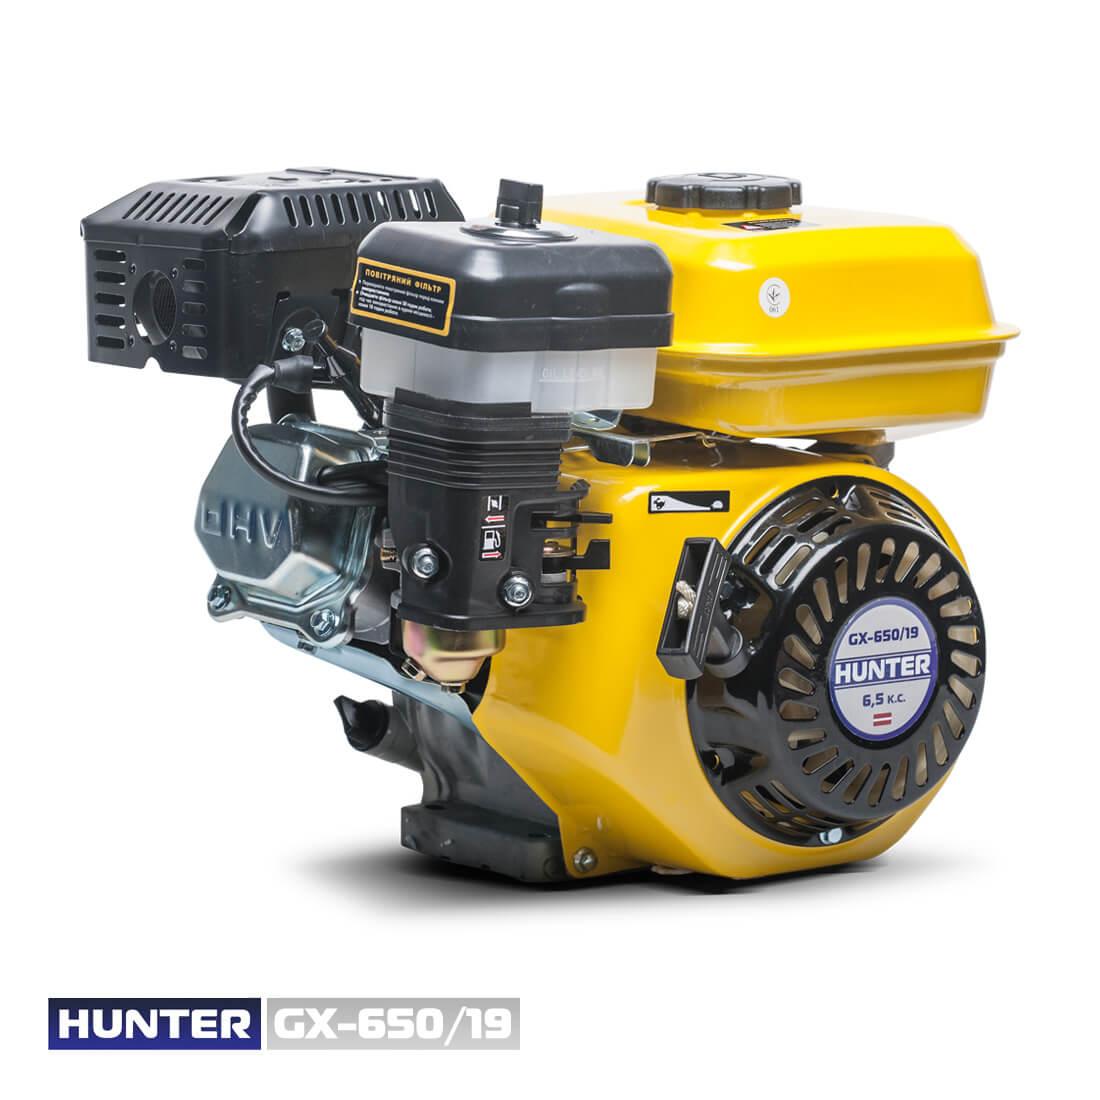 Фото GX-650/19 (шпонка) цена 2950грн №3 — Hunter